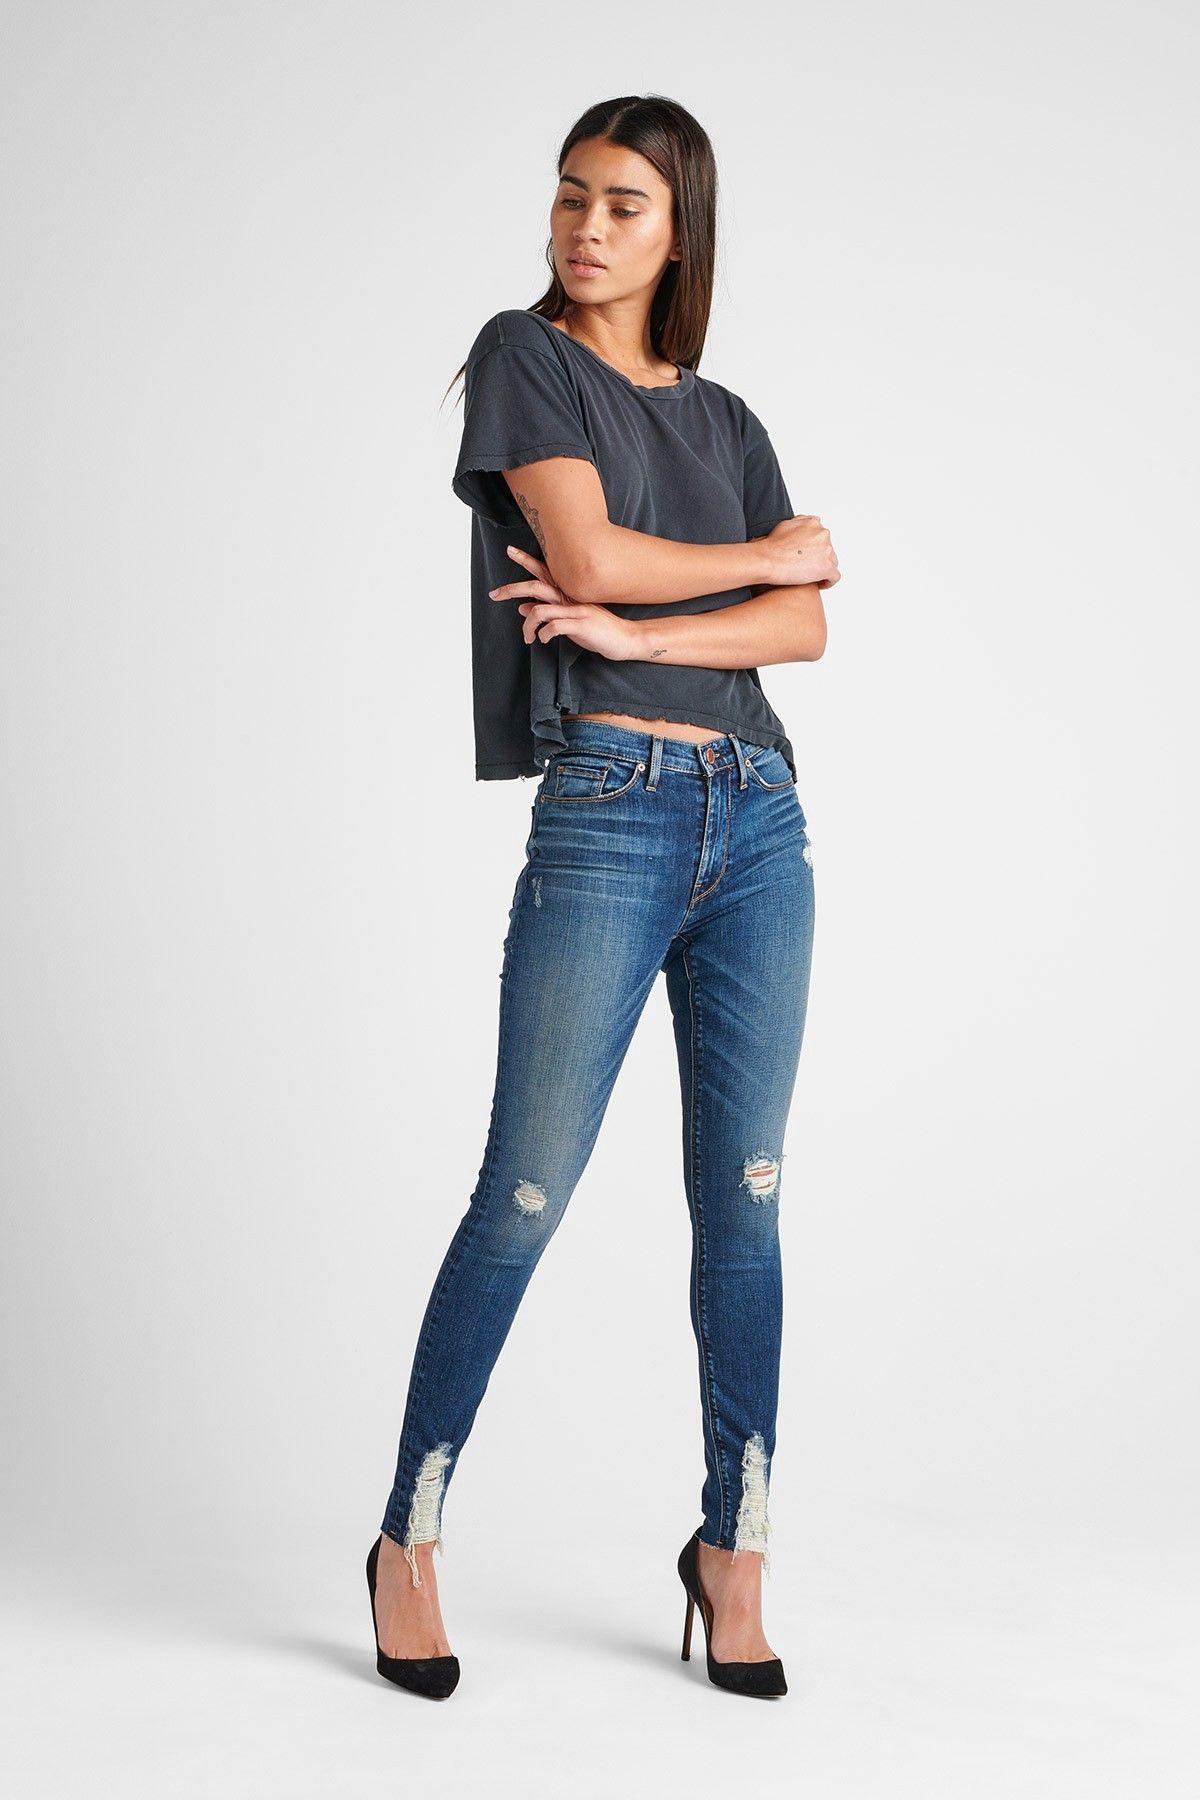 Hudson Jeans Barbara High Rise Super Skinny Ankle Jean - Lockdown 23